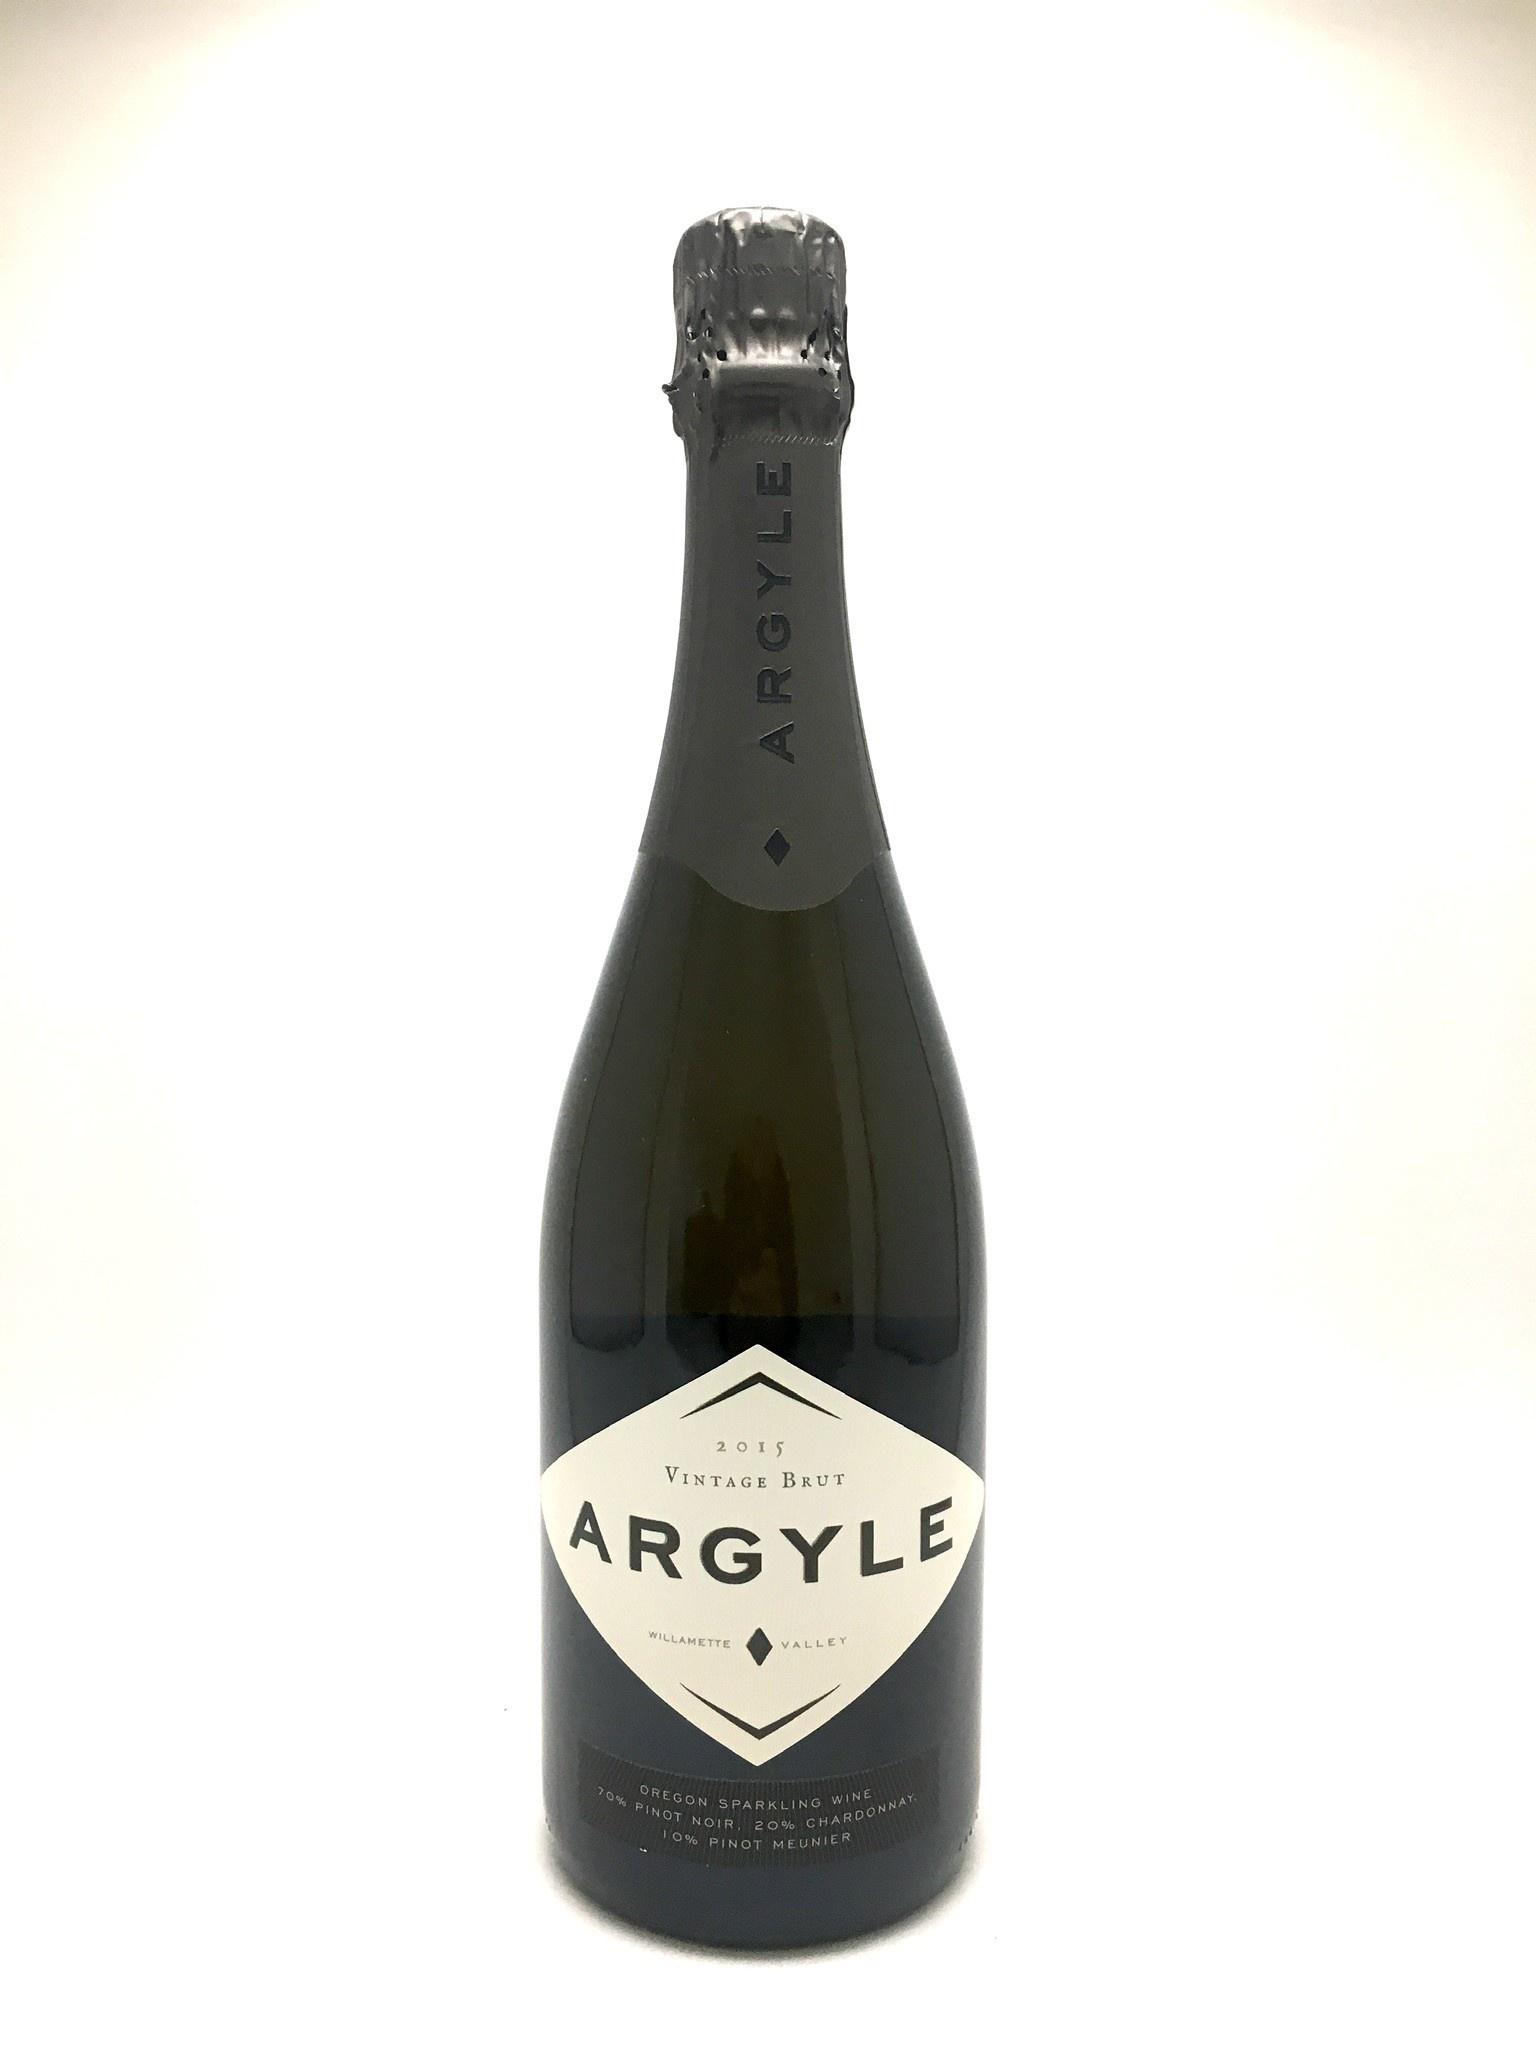 Argyle Winery, Vintage Brut Grower Series Willamette Valley 2015